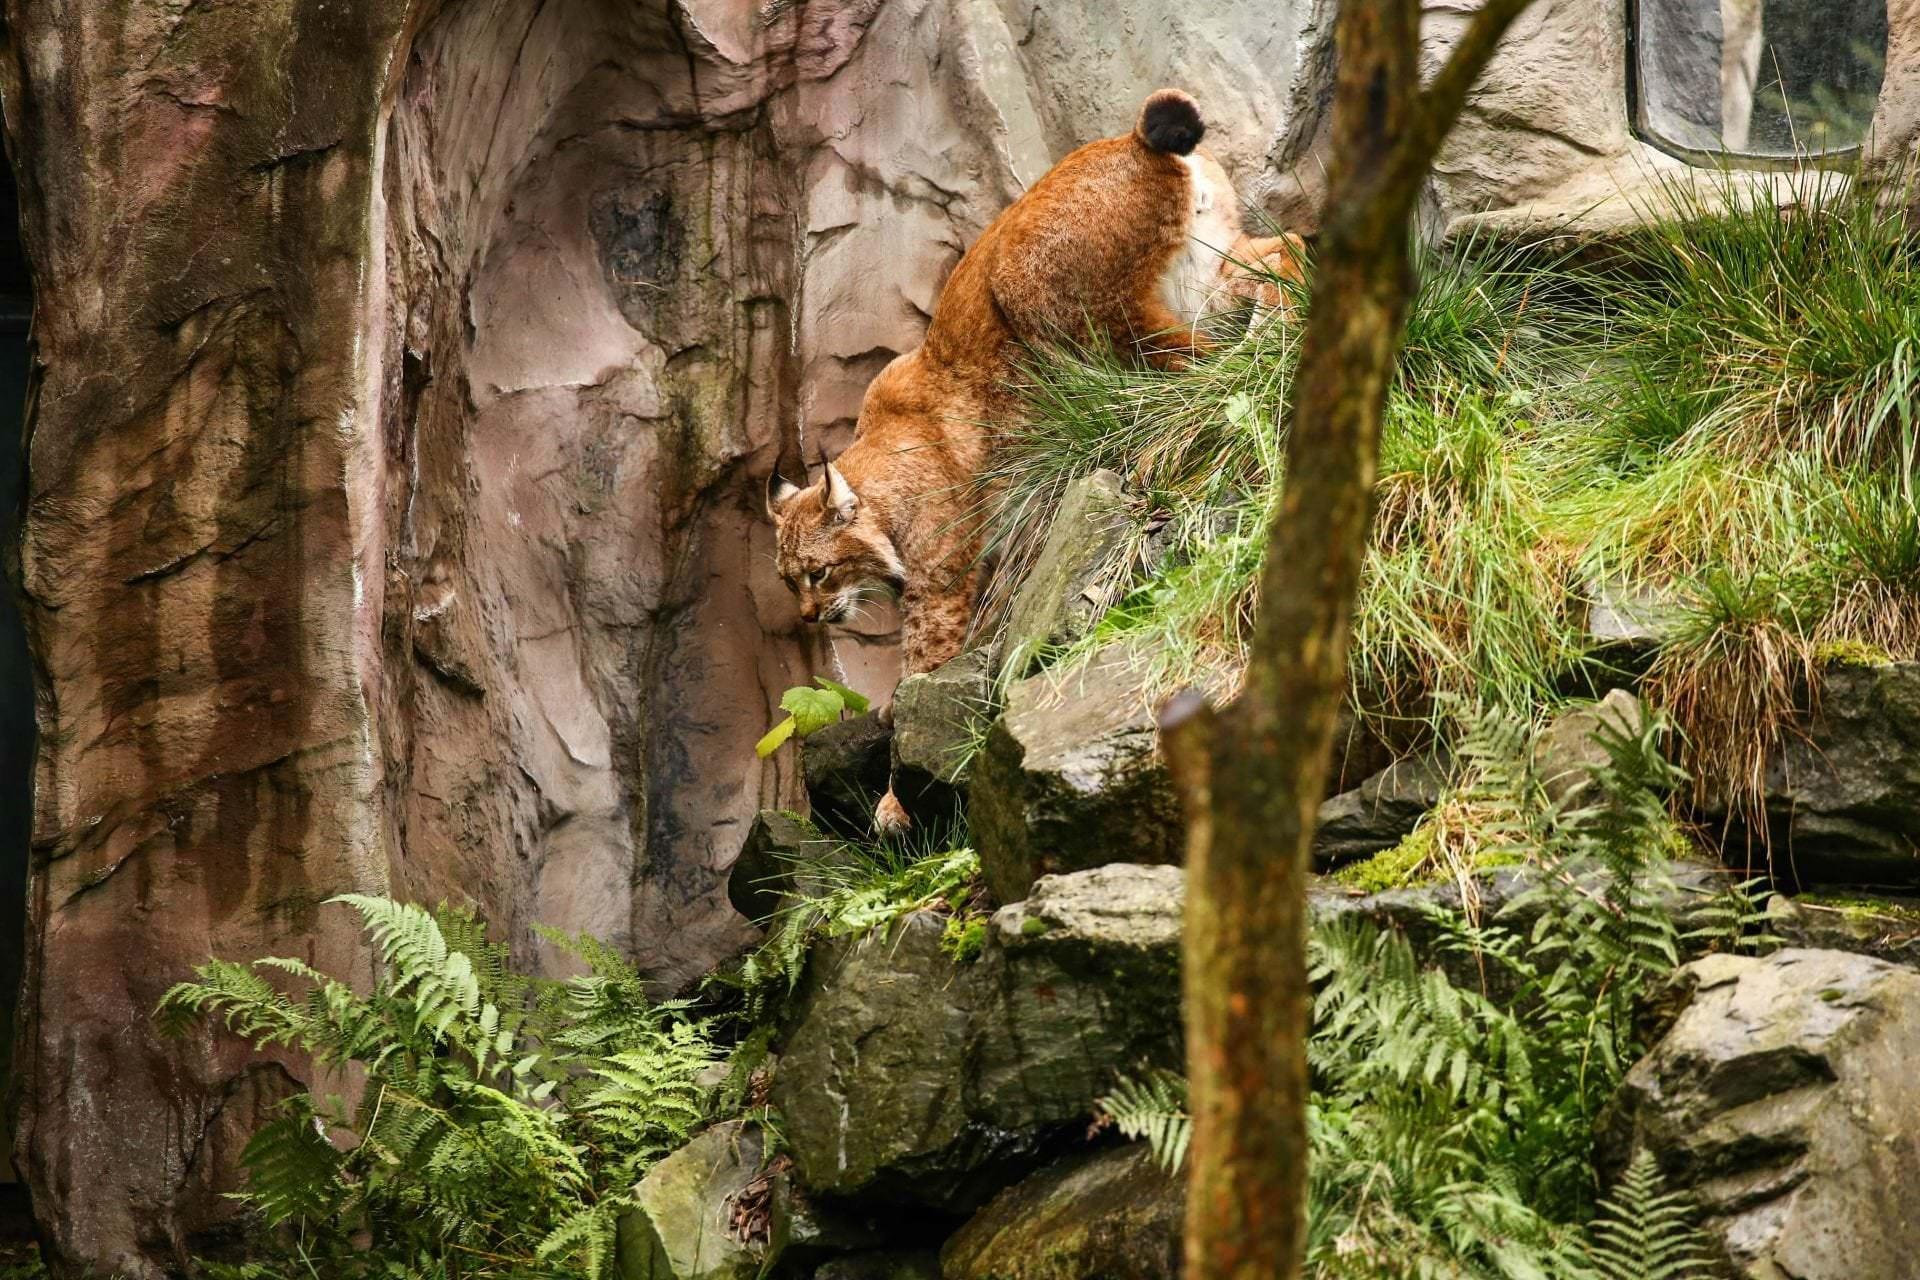 Objektivtest im Zoo